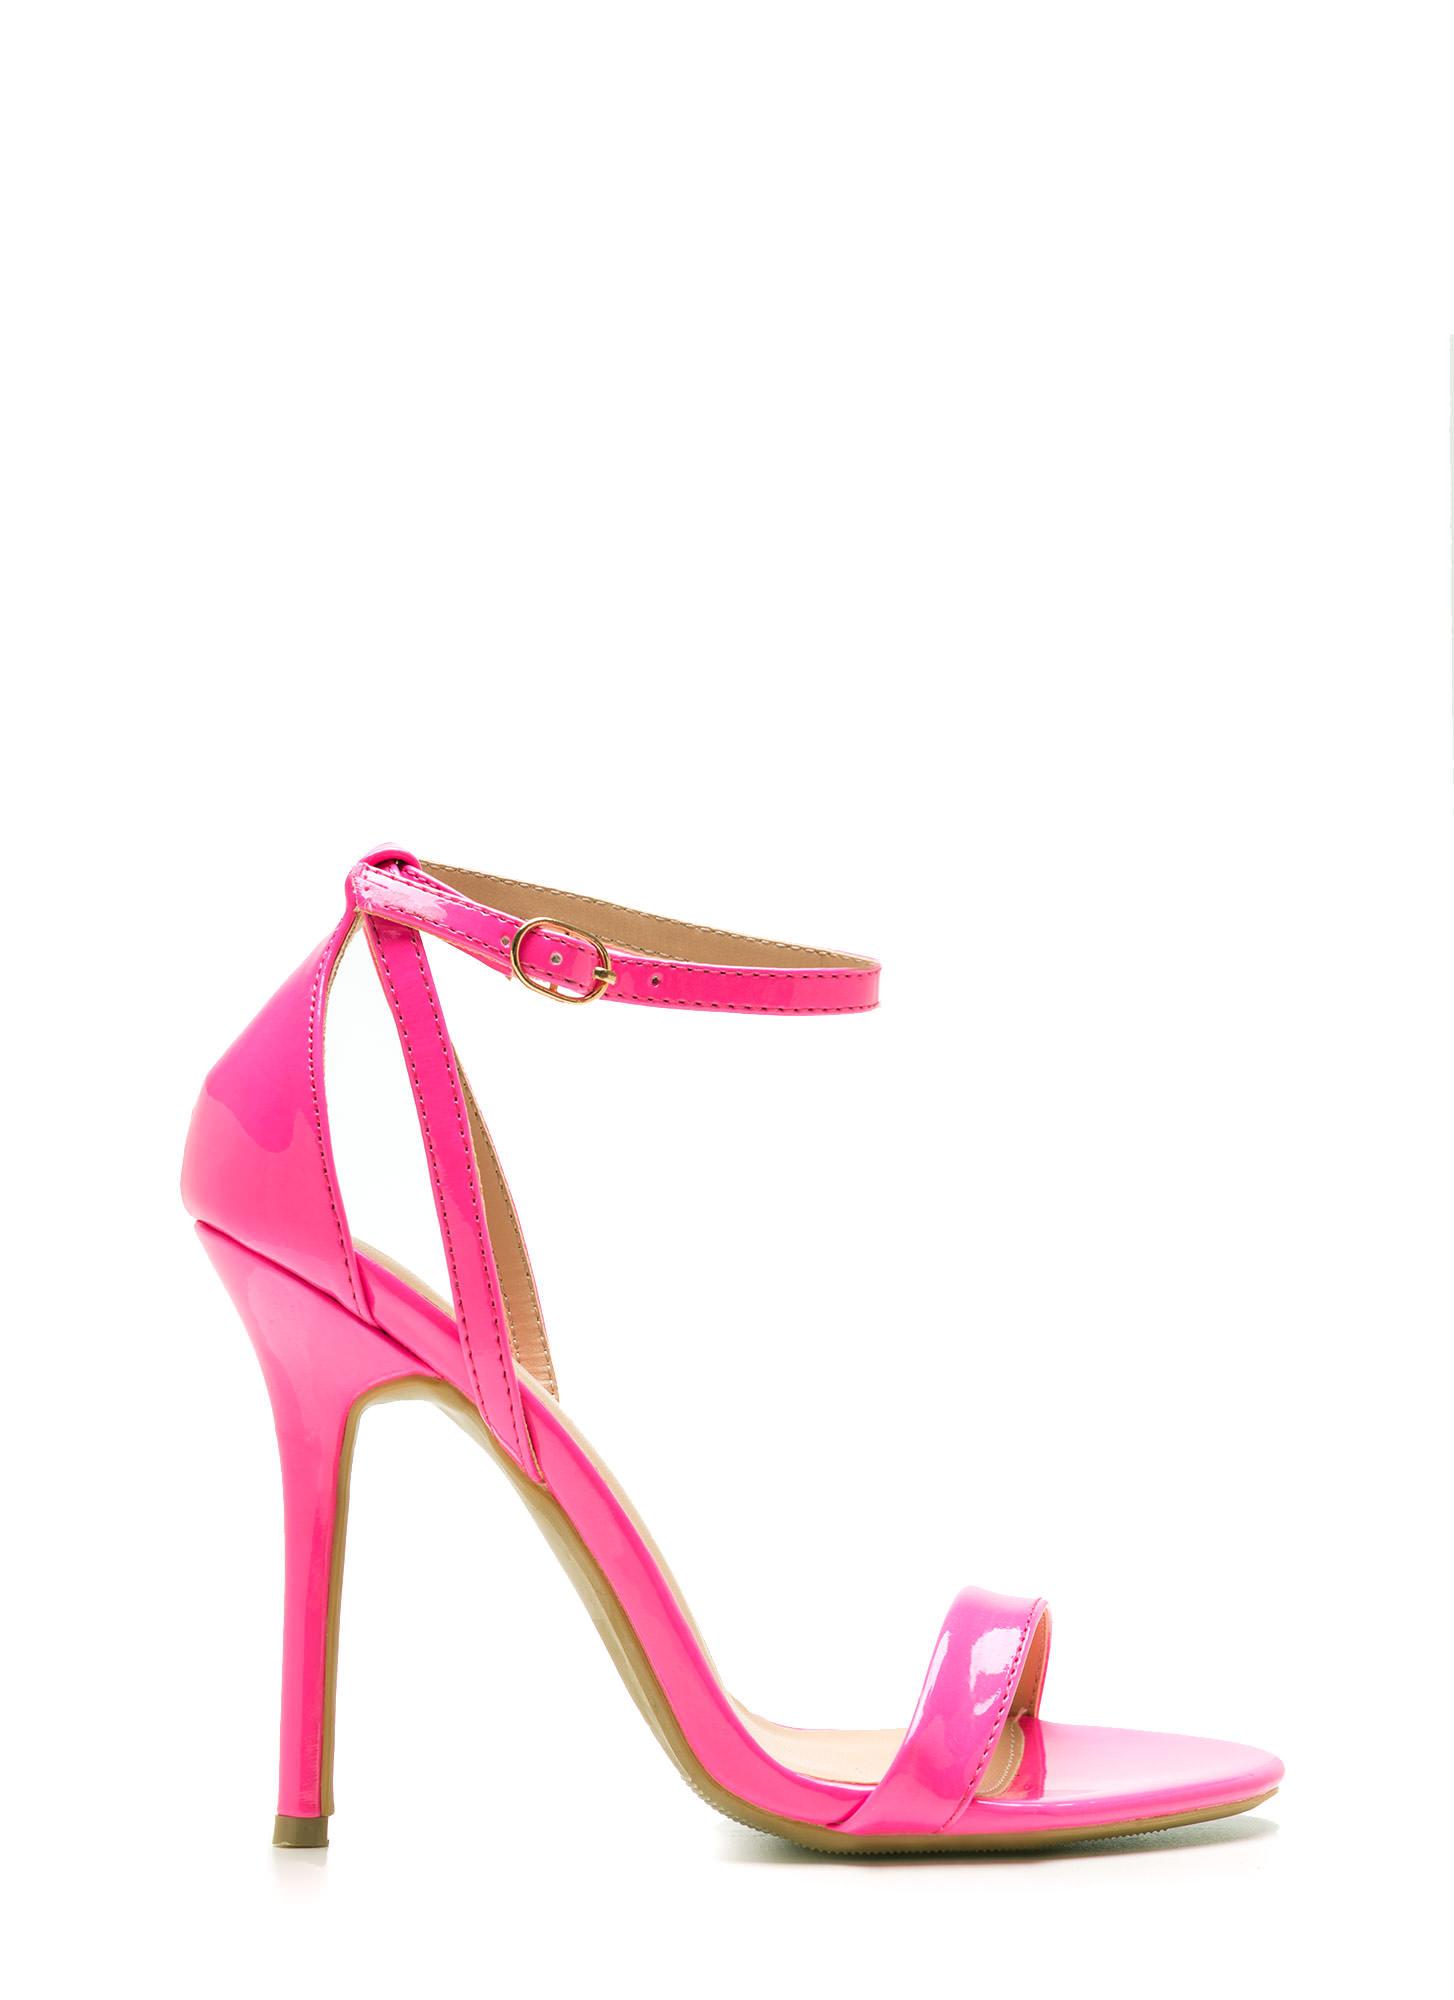 Neon Pink Strappy Heels